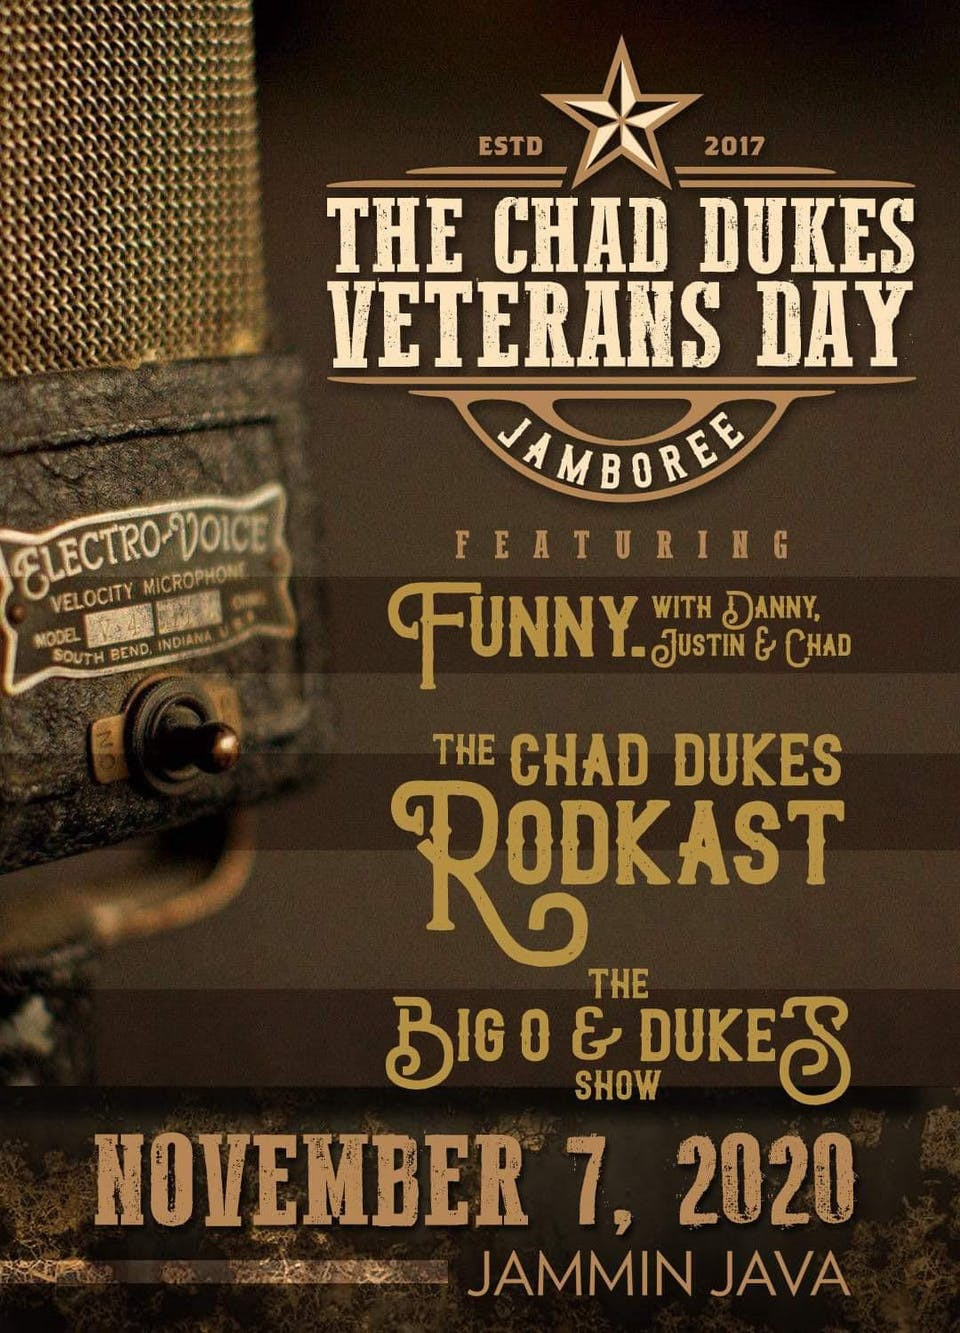 The Chad Dukes Veterans Day Jamboree